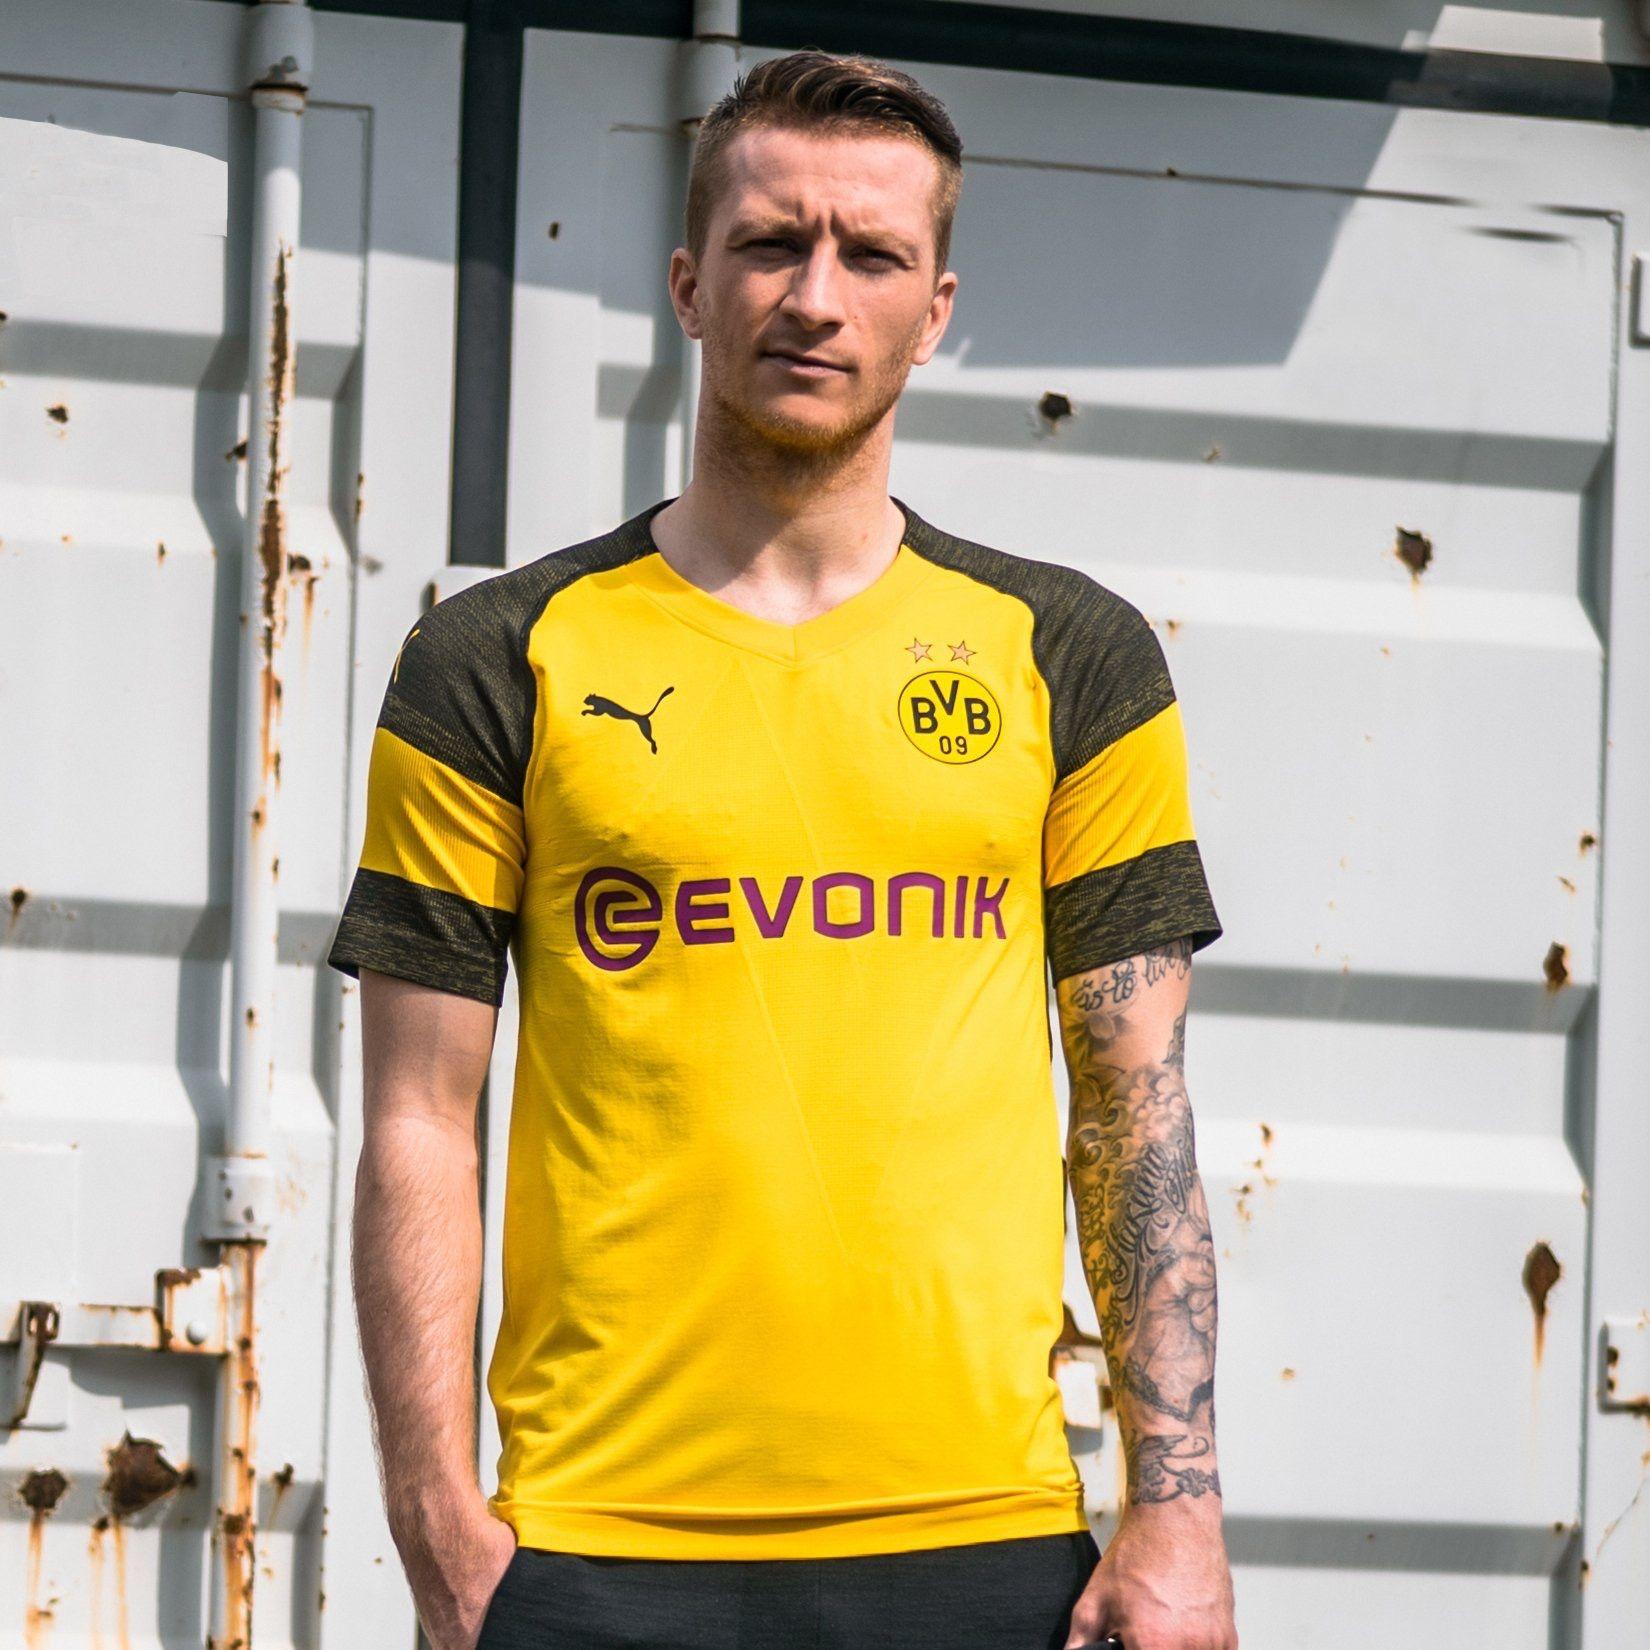 Borussia Dortmund 2018/2019 Home Kit | Marco reus, Reus, Fútbol